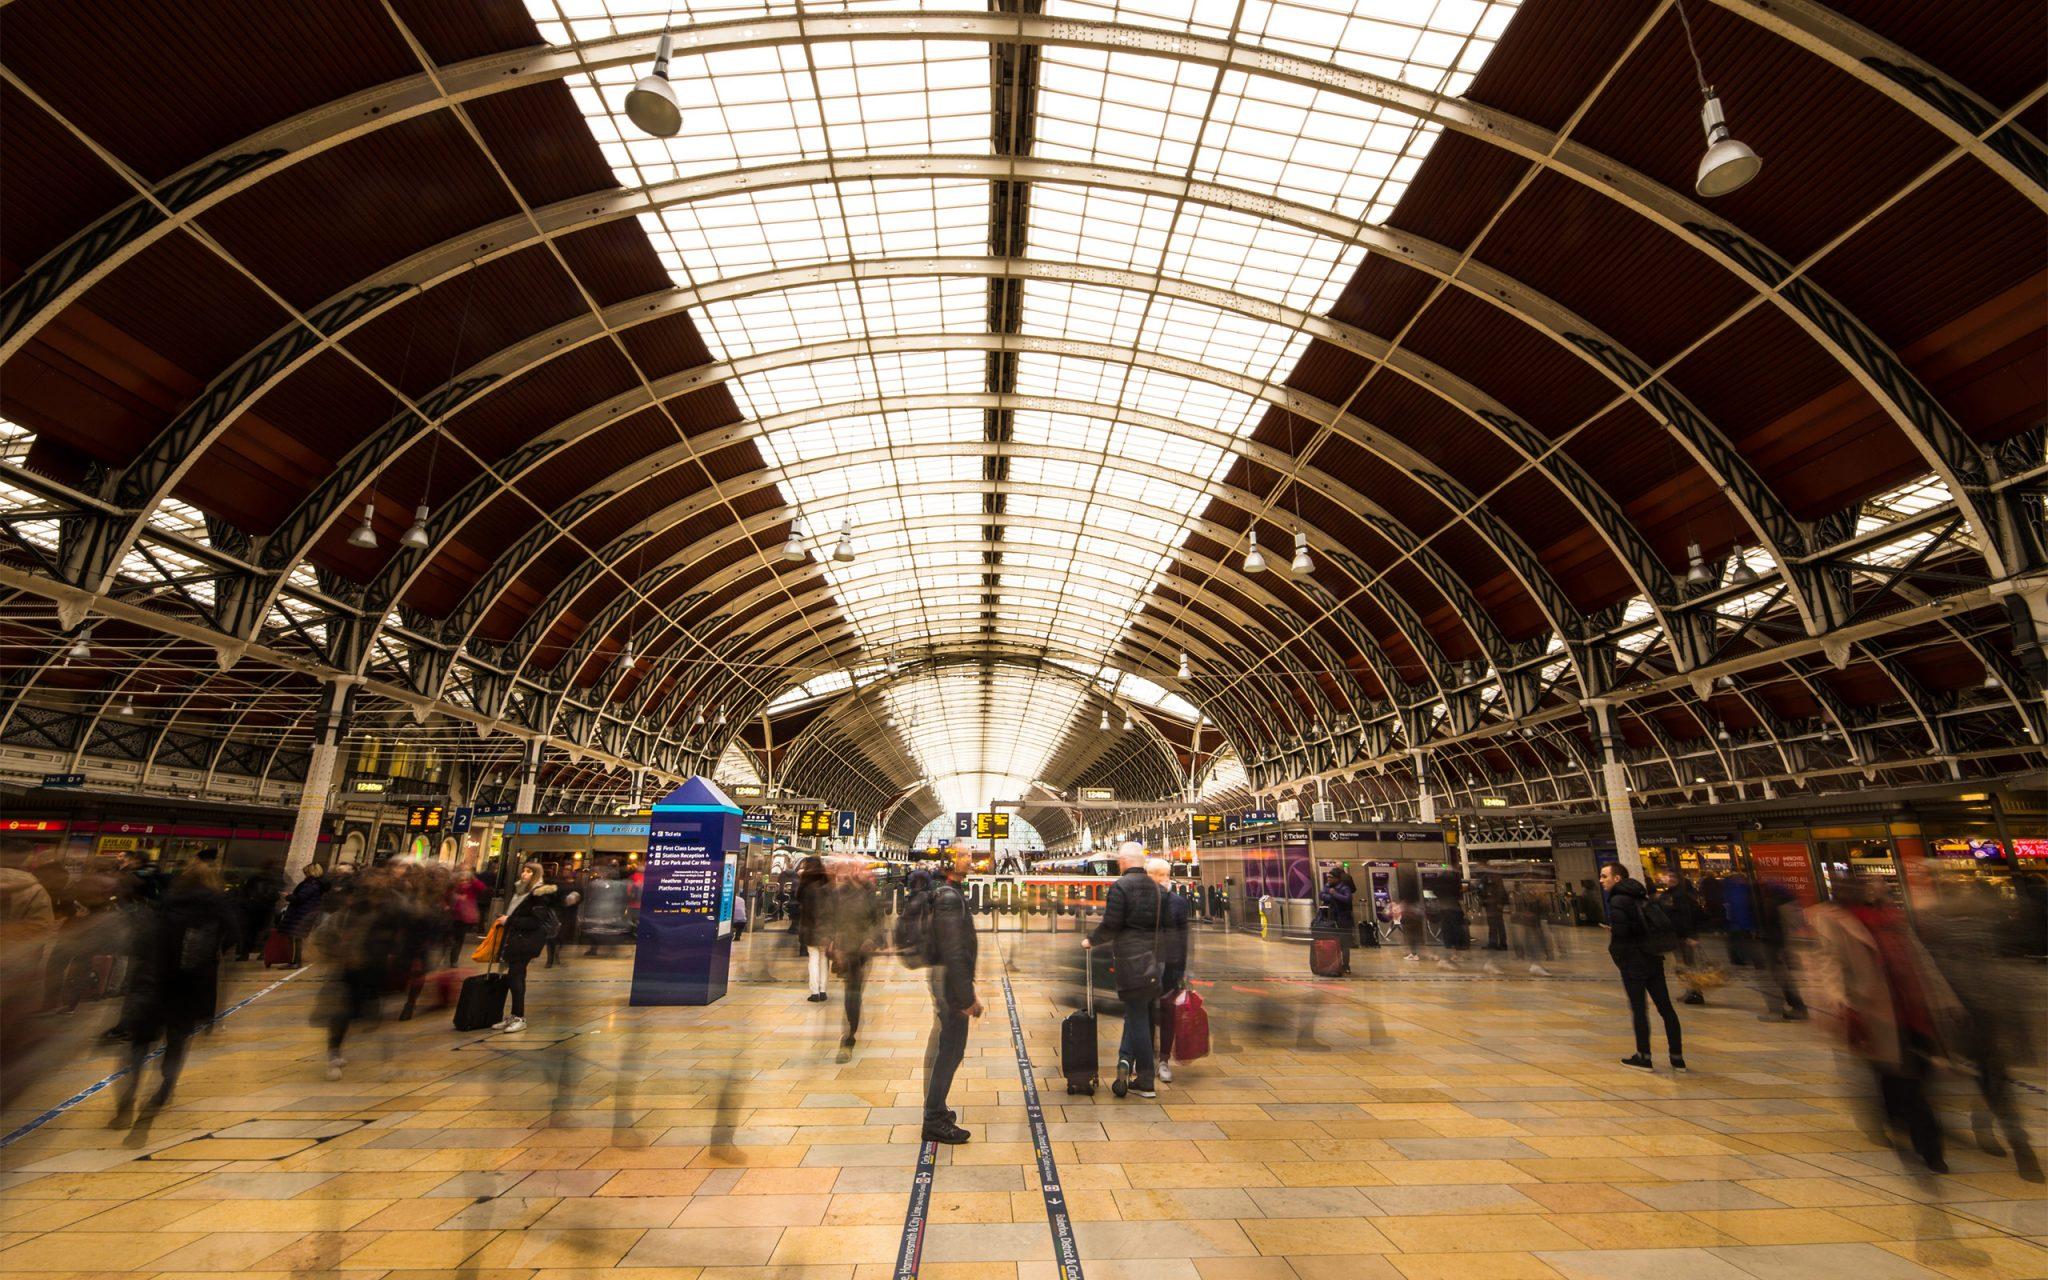 Paddington Railway Station, Long-exposure, Railways, Transport, London, commuters, transportation, World Cities,